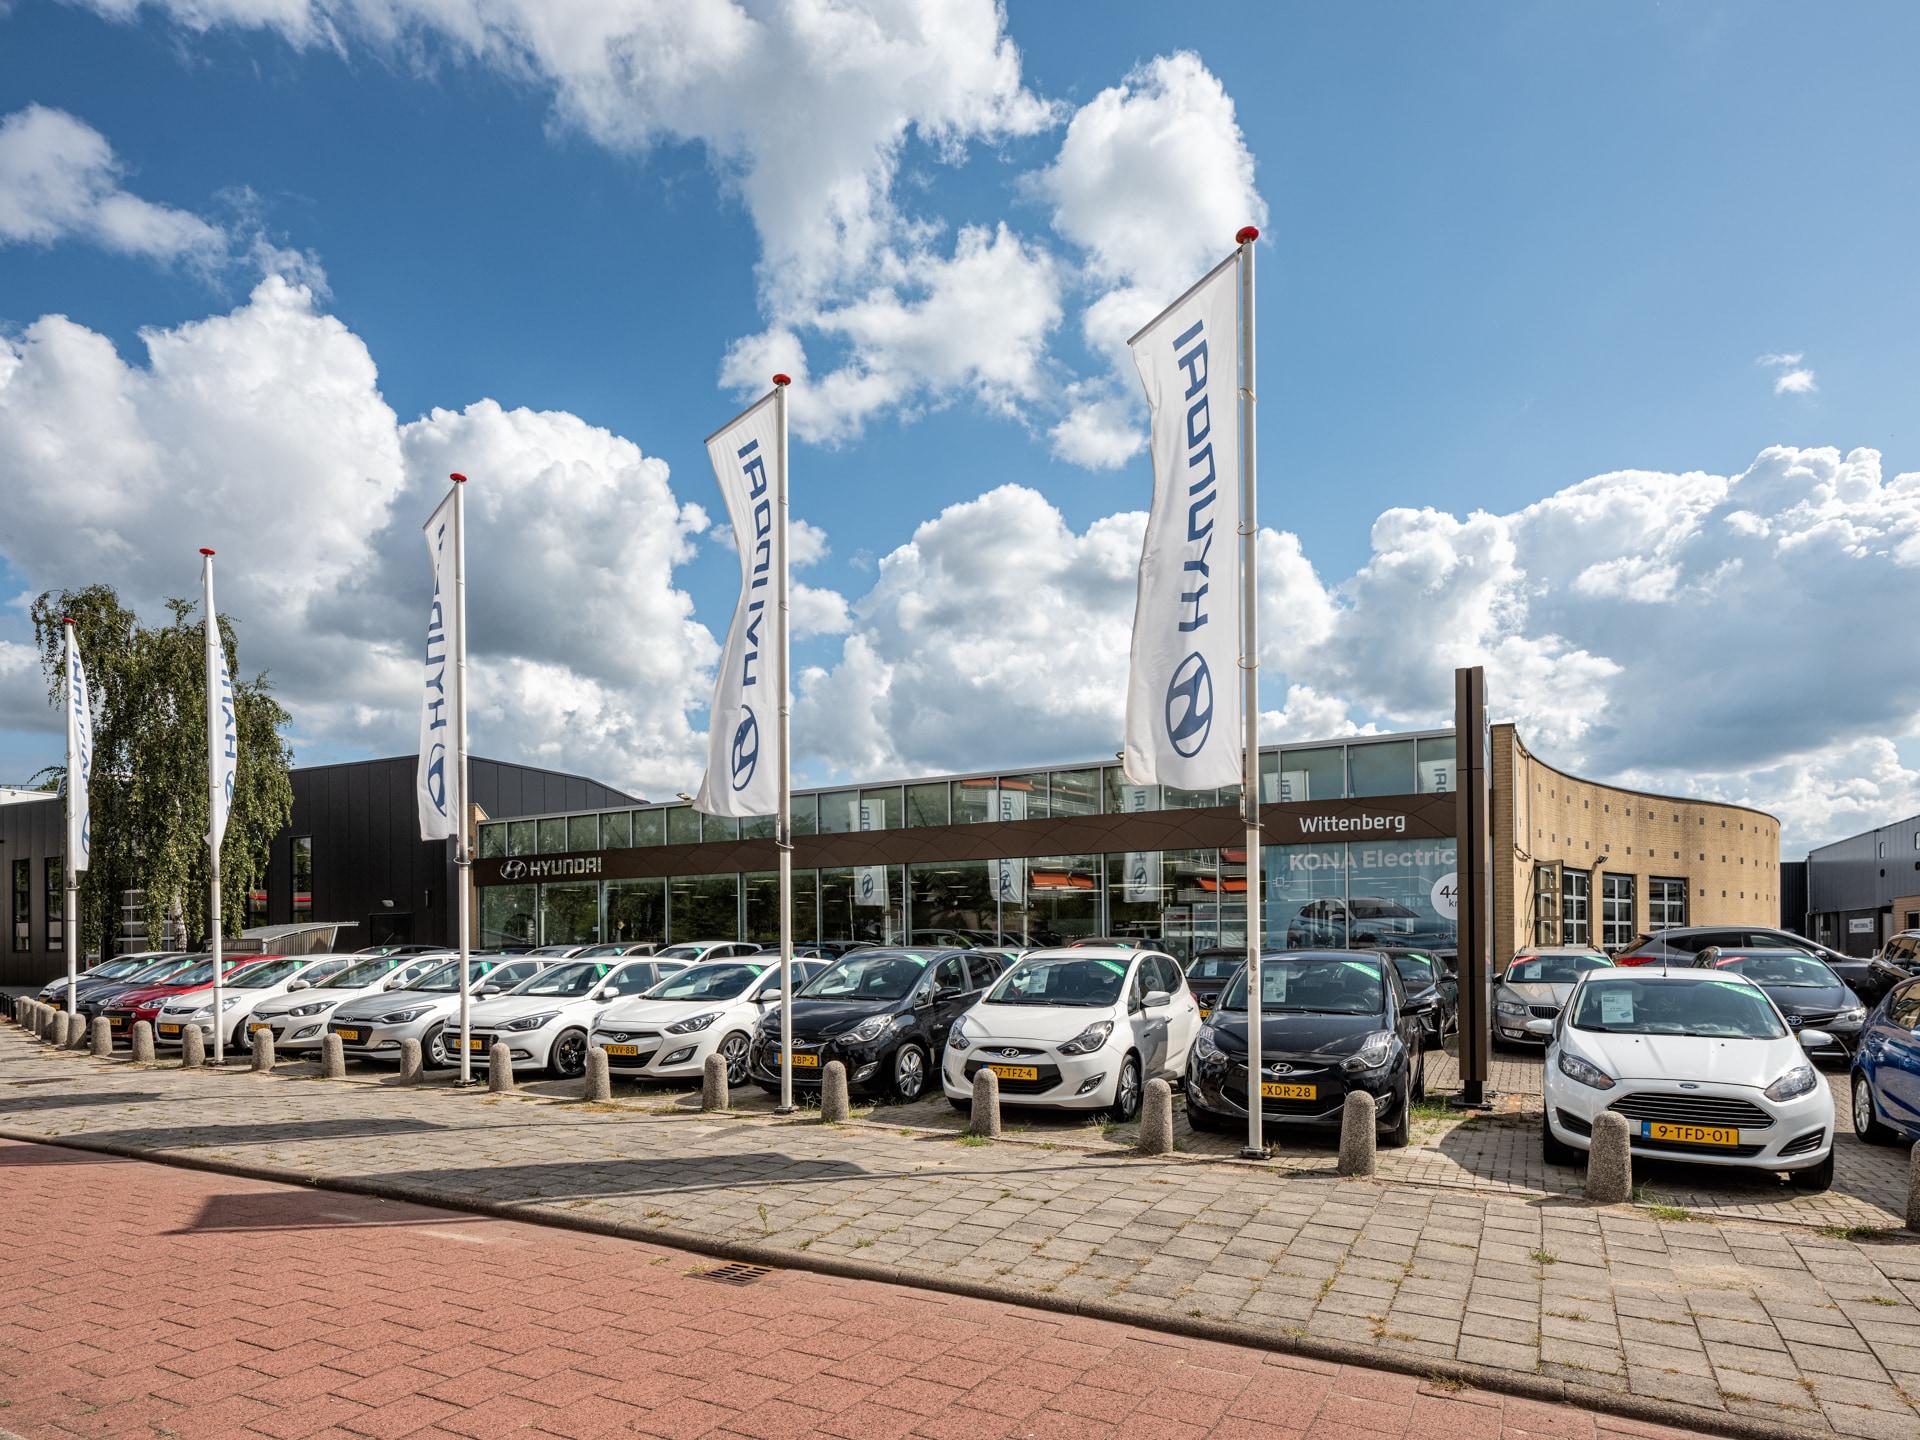 Hyundai Wittenberg Hilversum